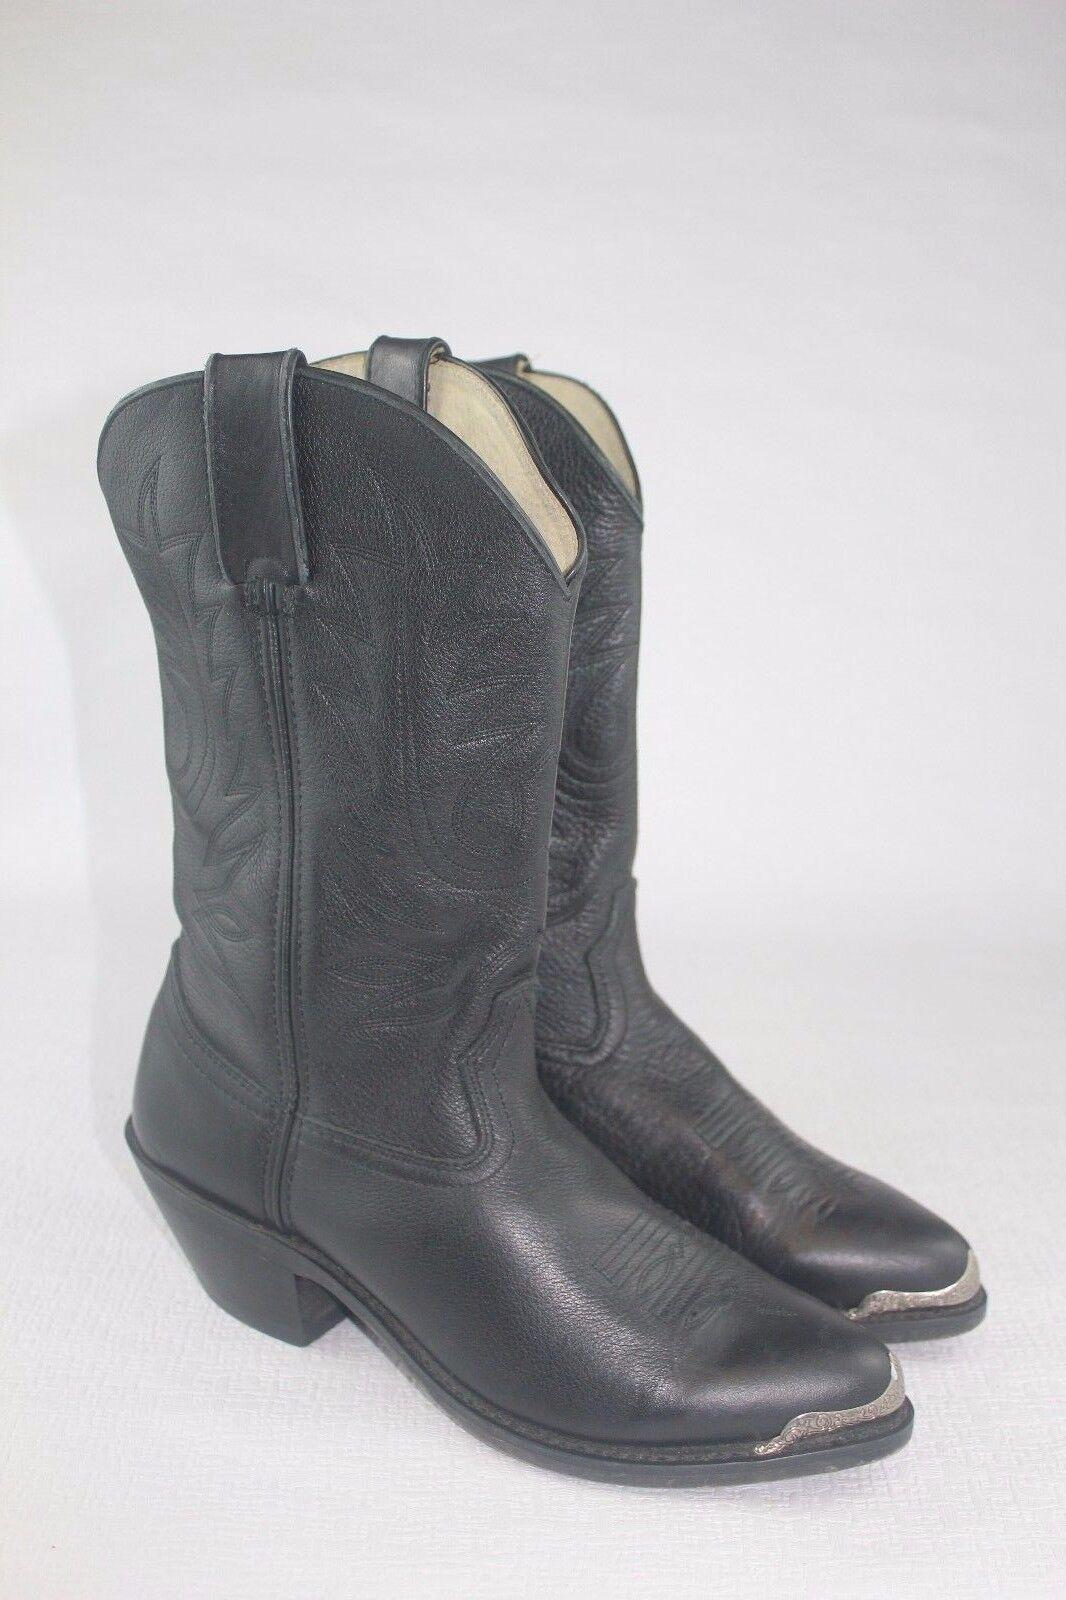 Durango Durango Durango Outlaw Western Boots - DB560 Size 7.5 M a1a7e0